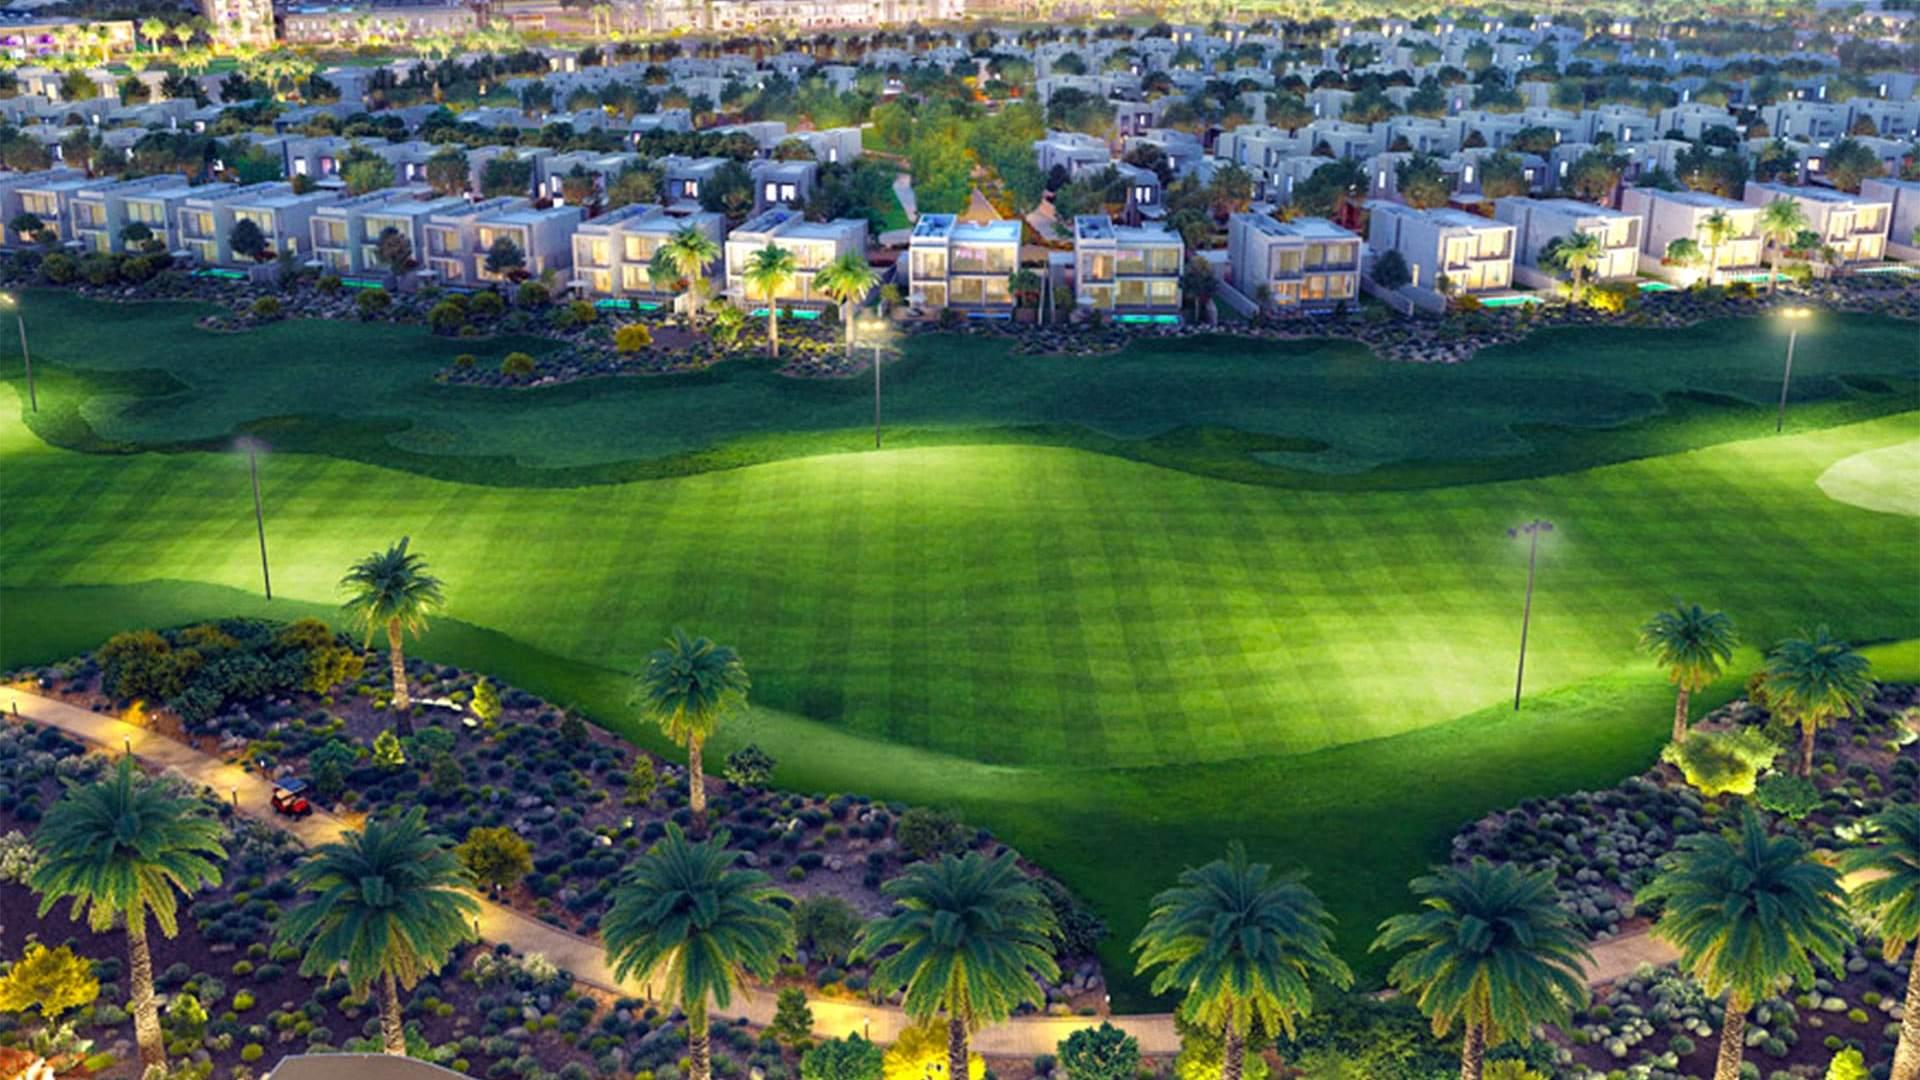 EXPO GOLF, Dubai South (Dubai World Central), UAE – photo 5